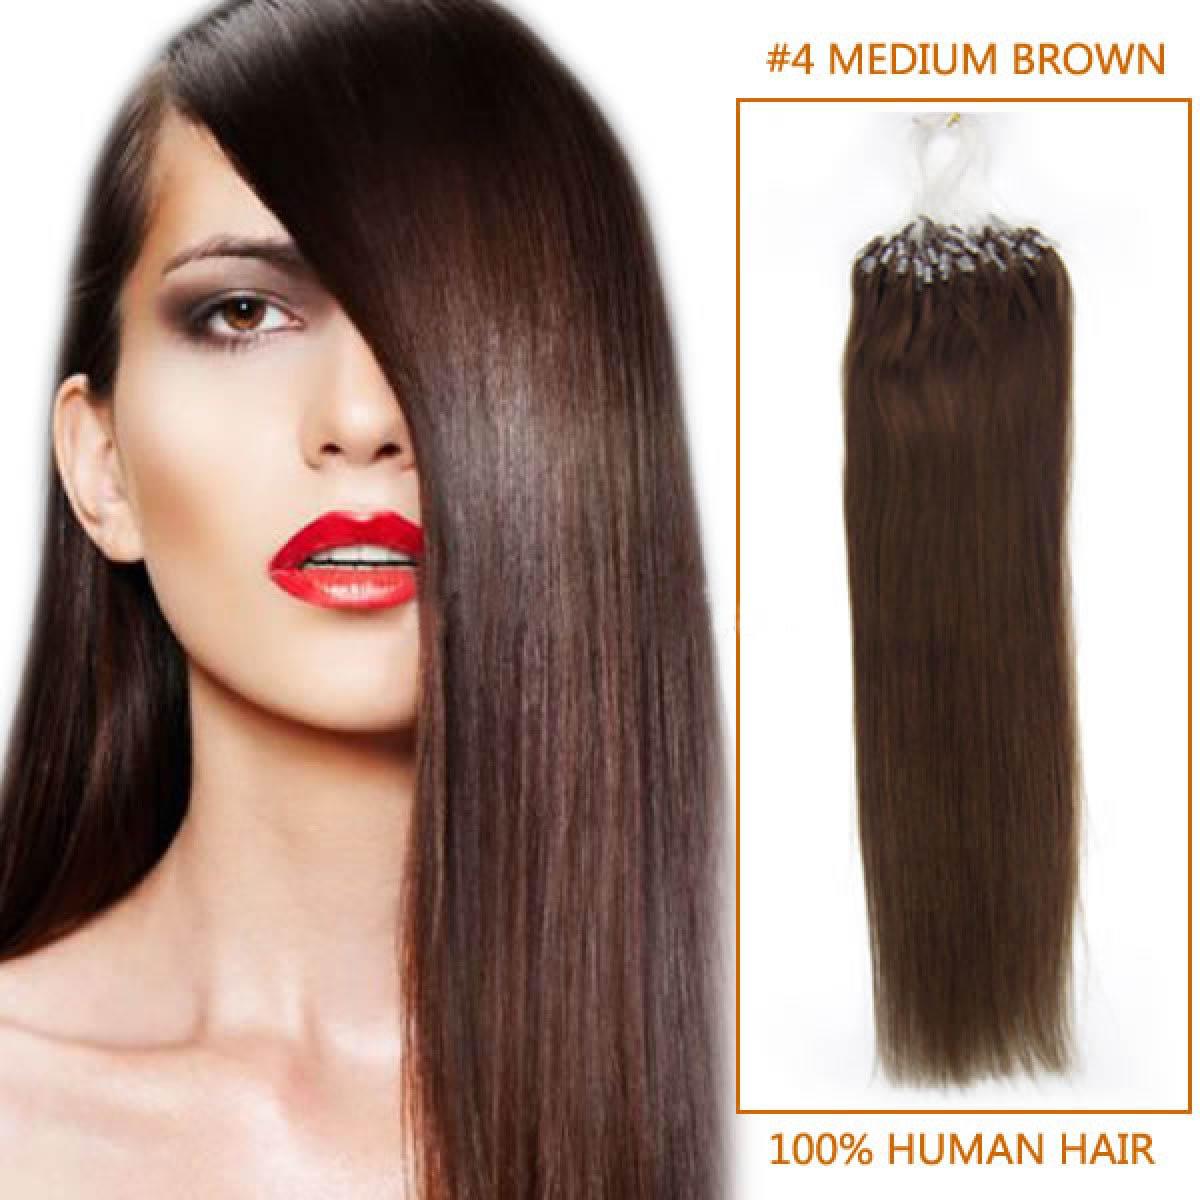 Enjoyable Inch 4 Medium Brown Micro Loop Human Hair Extensions 100S Short Hairstyles For Black Women Fulllsitofus